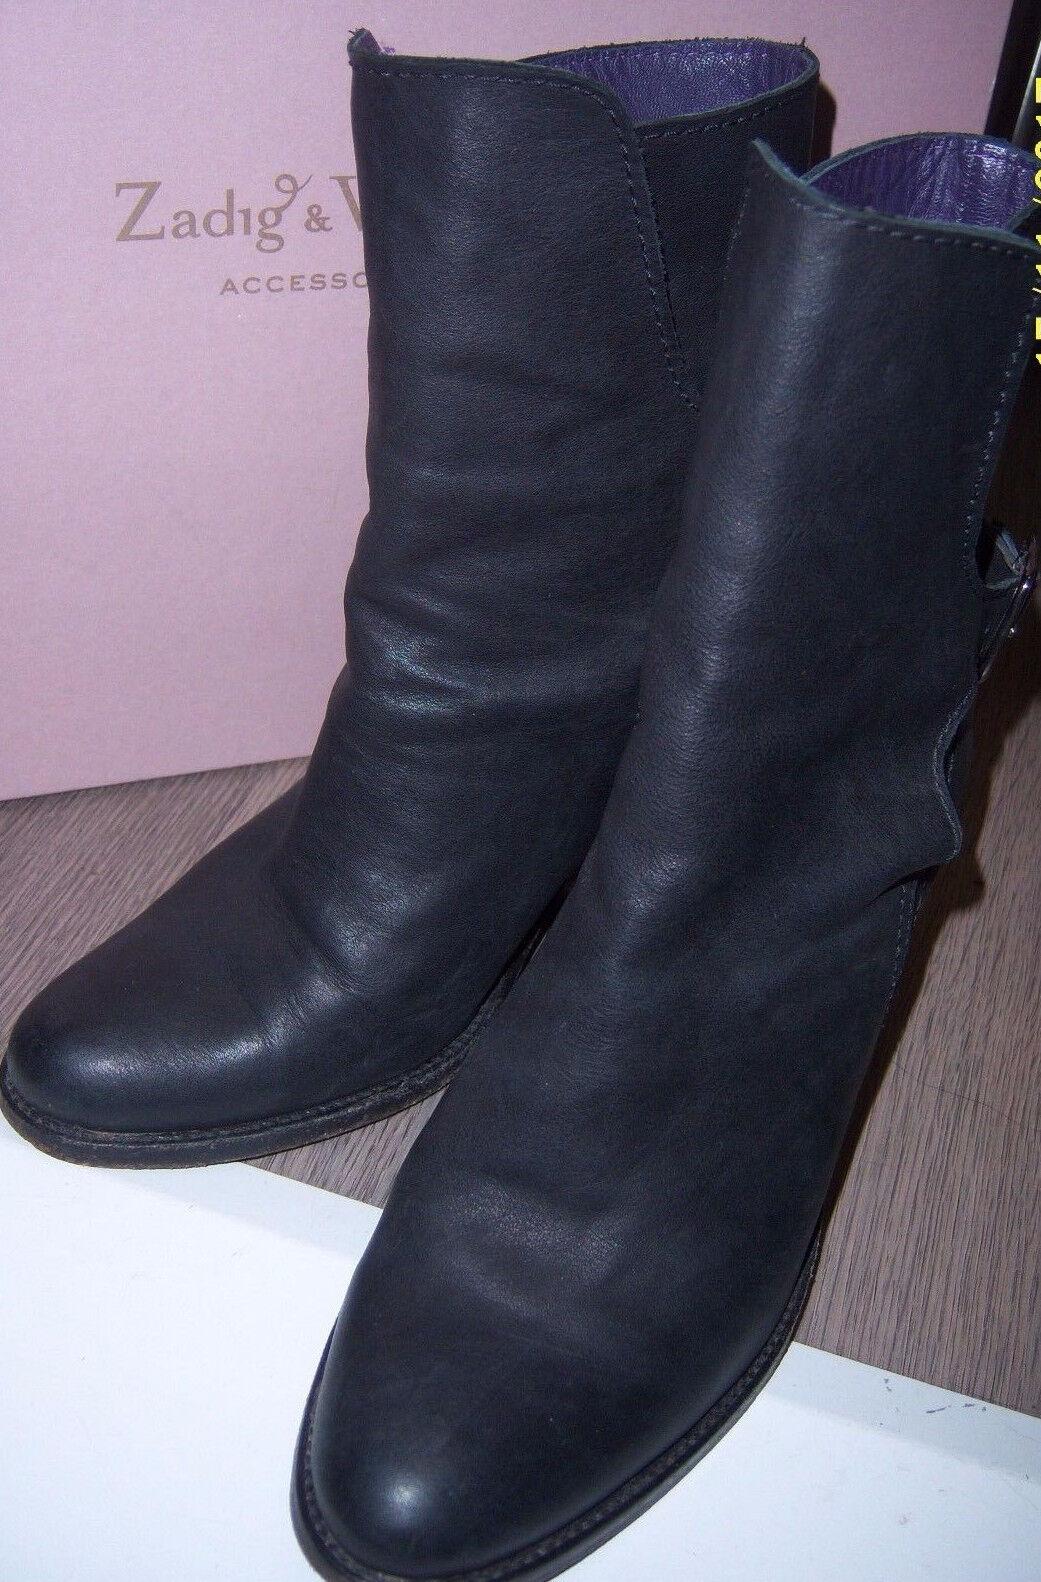 Zadig & Voltaire bottines cuir 36   Zadig & Voltaire leather Boots US5  UK3